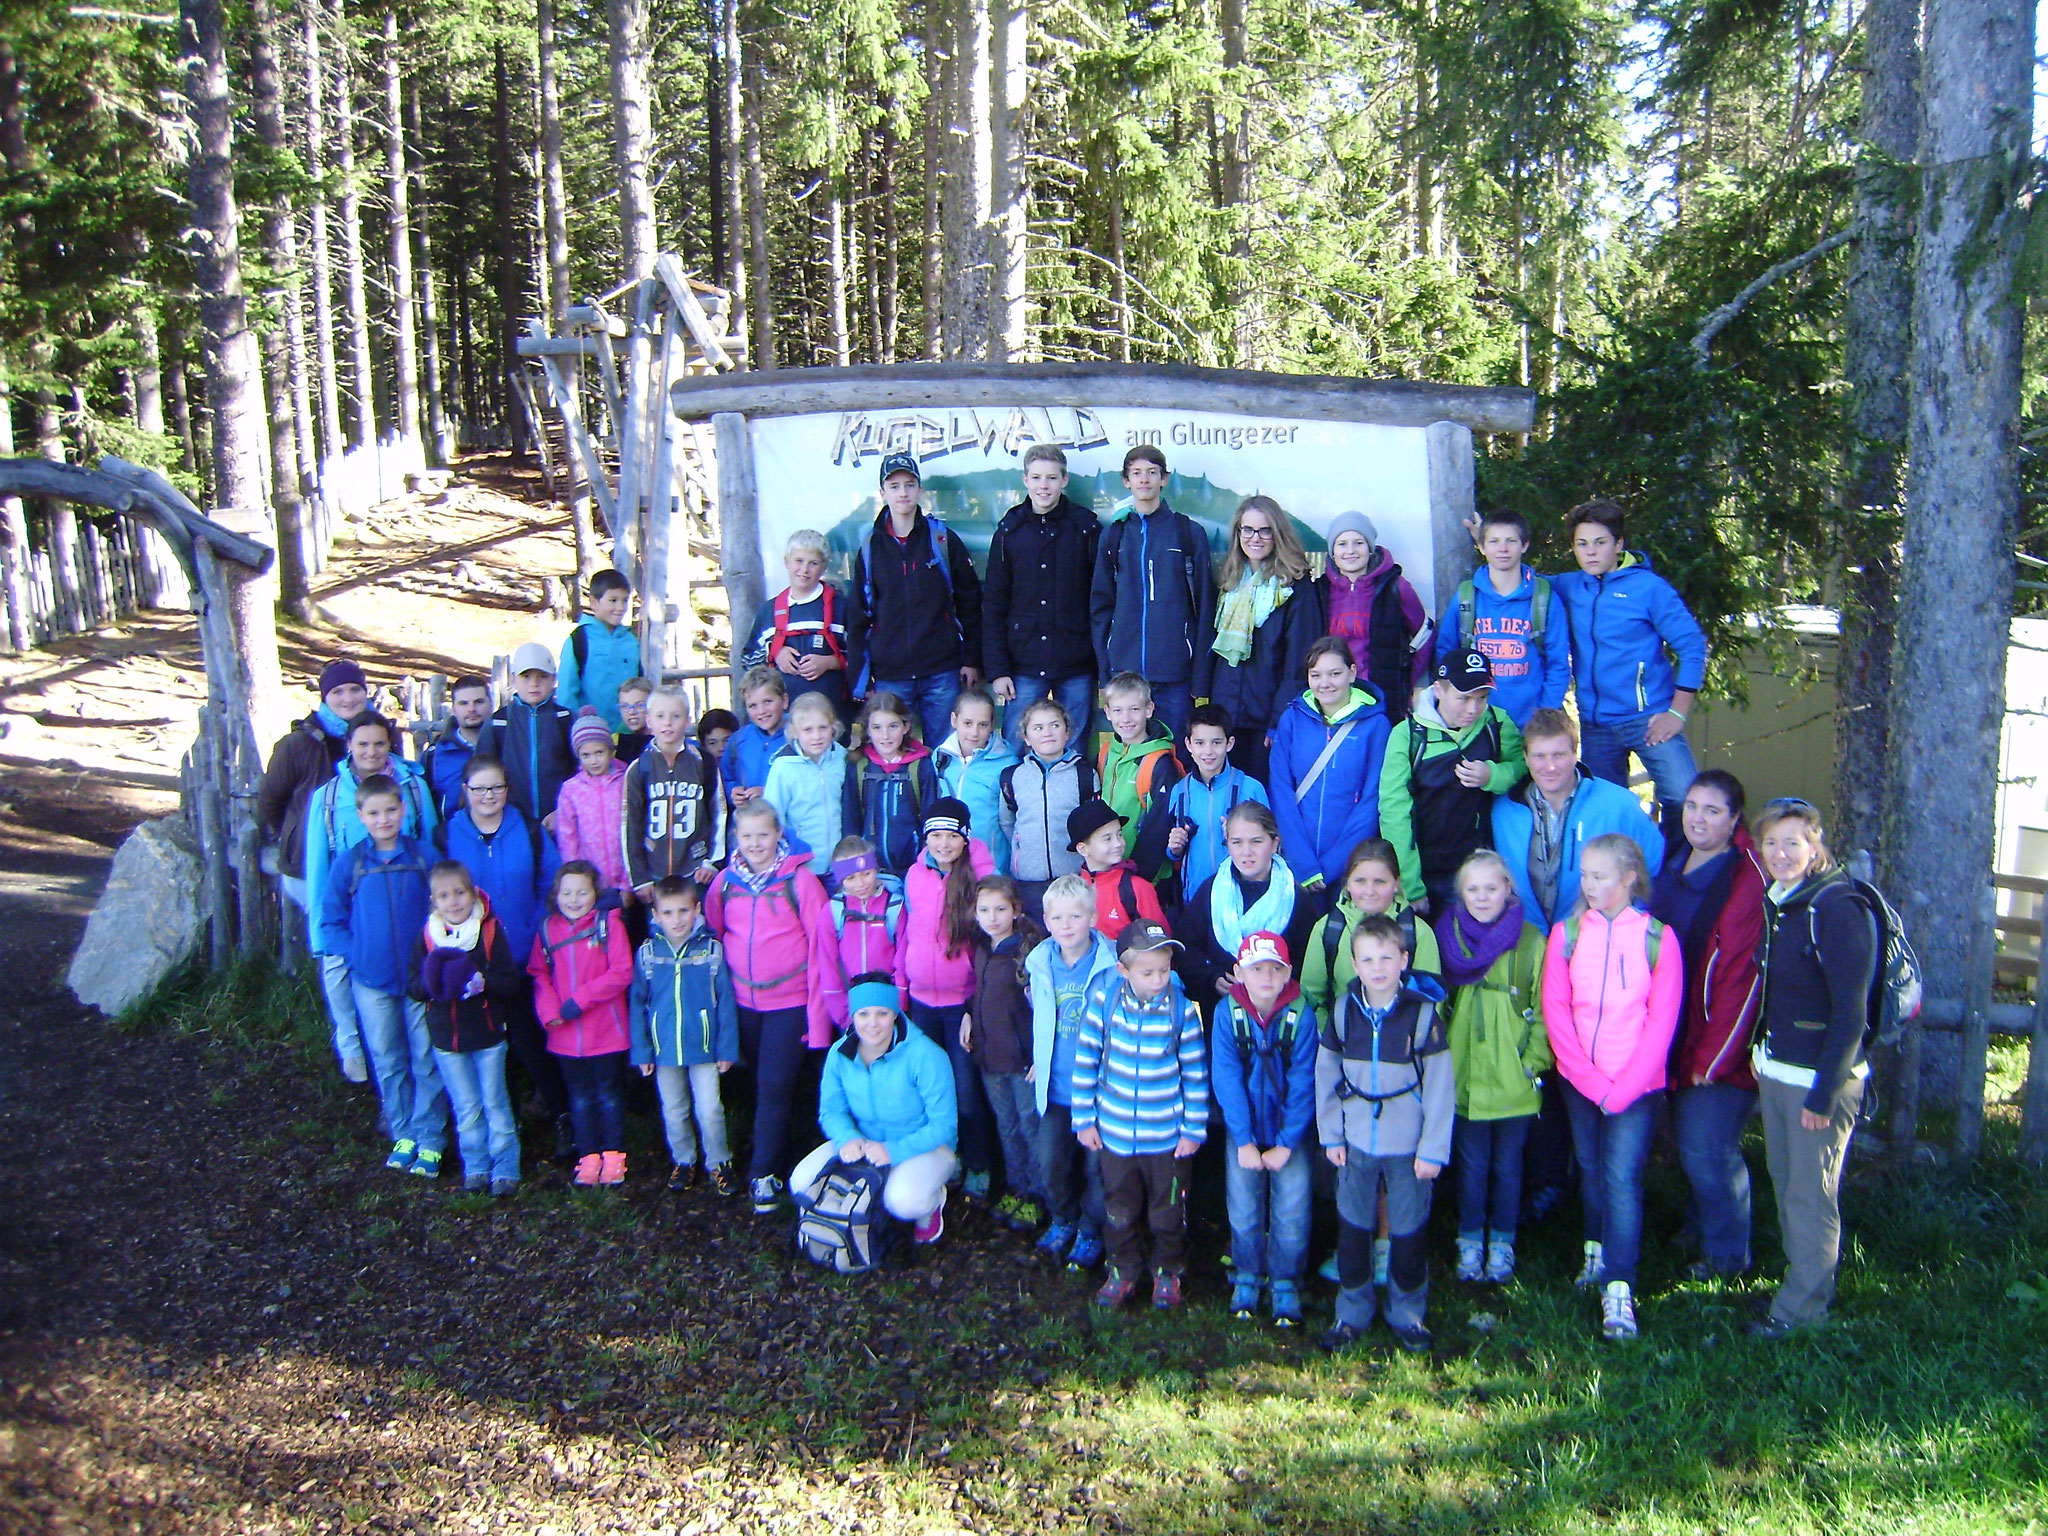 Ausflug der Hirschbergler Jugendgruppe